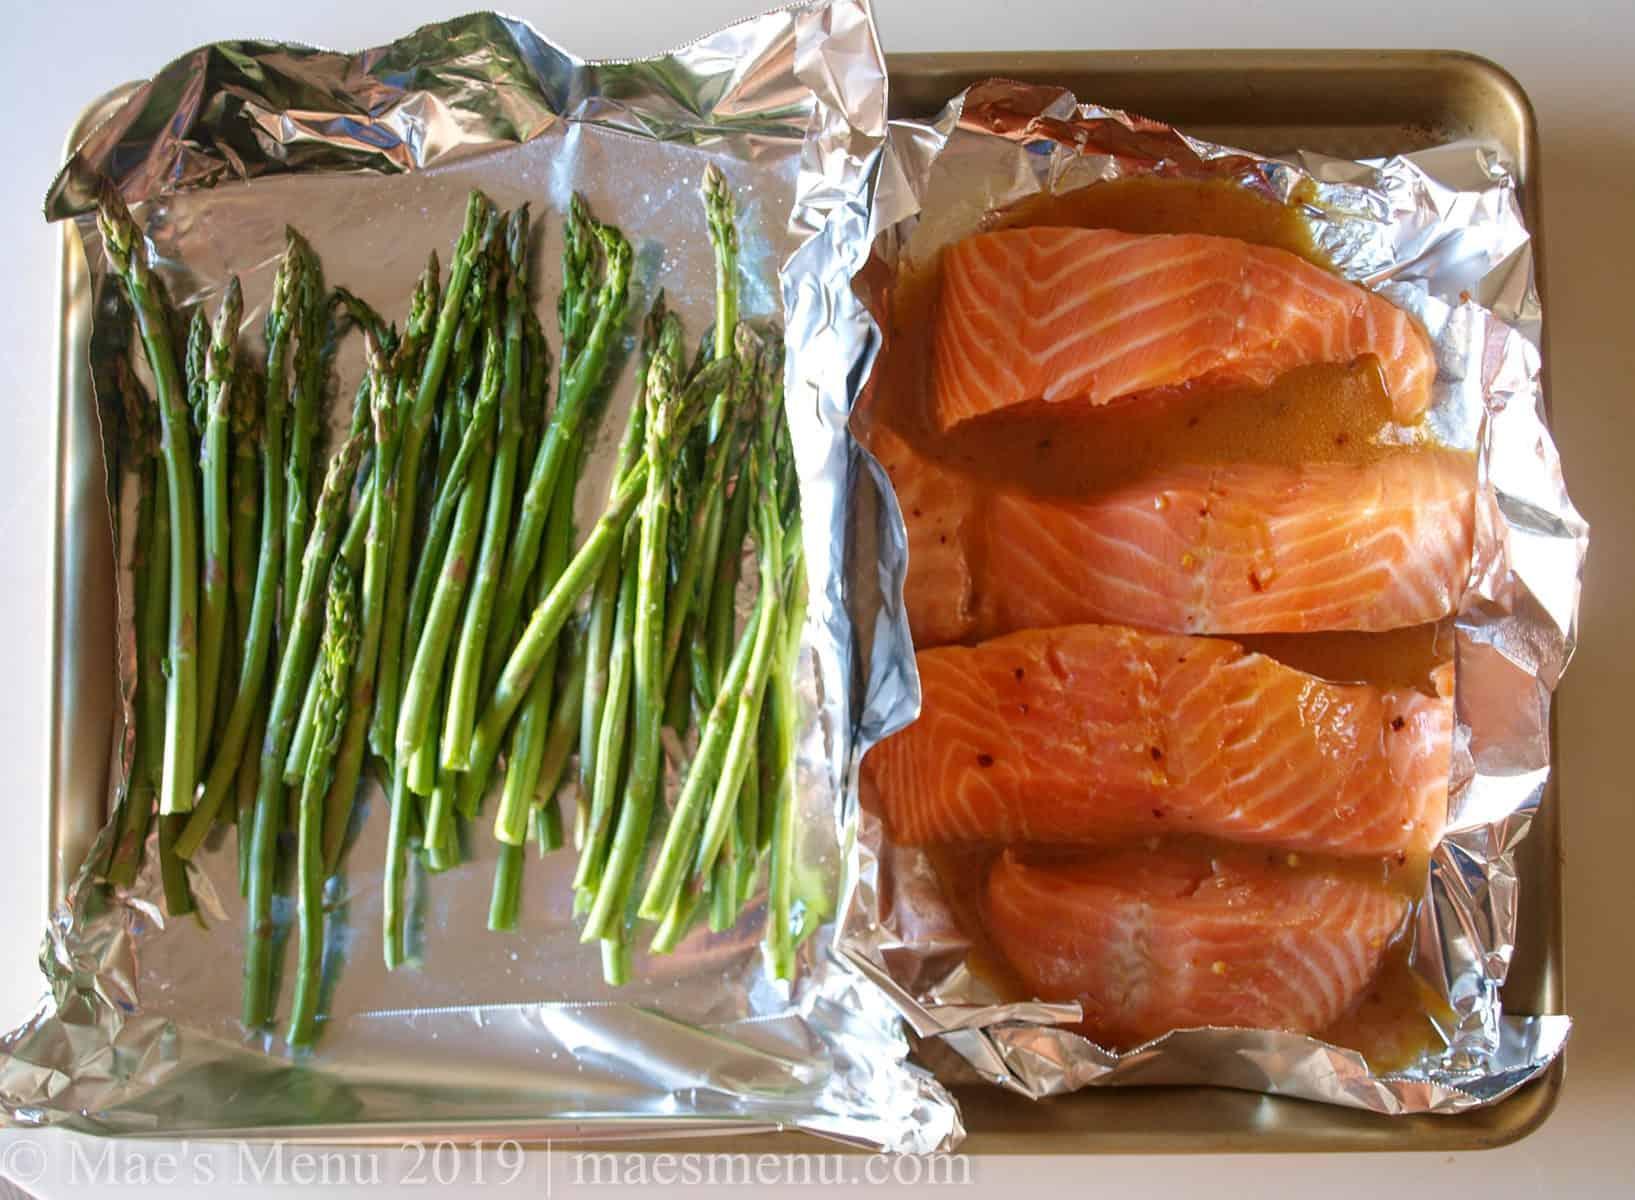 Salmon and asparagus roast in aluminum foil mini trays on a large baking sheet.